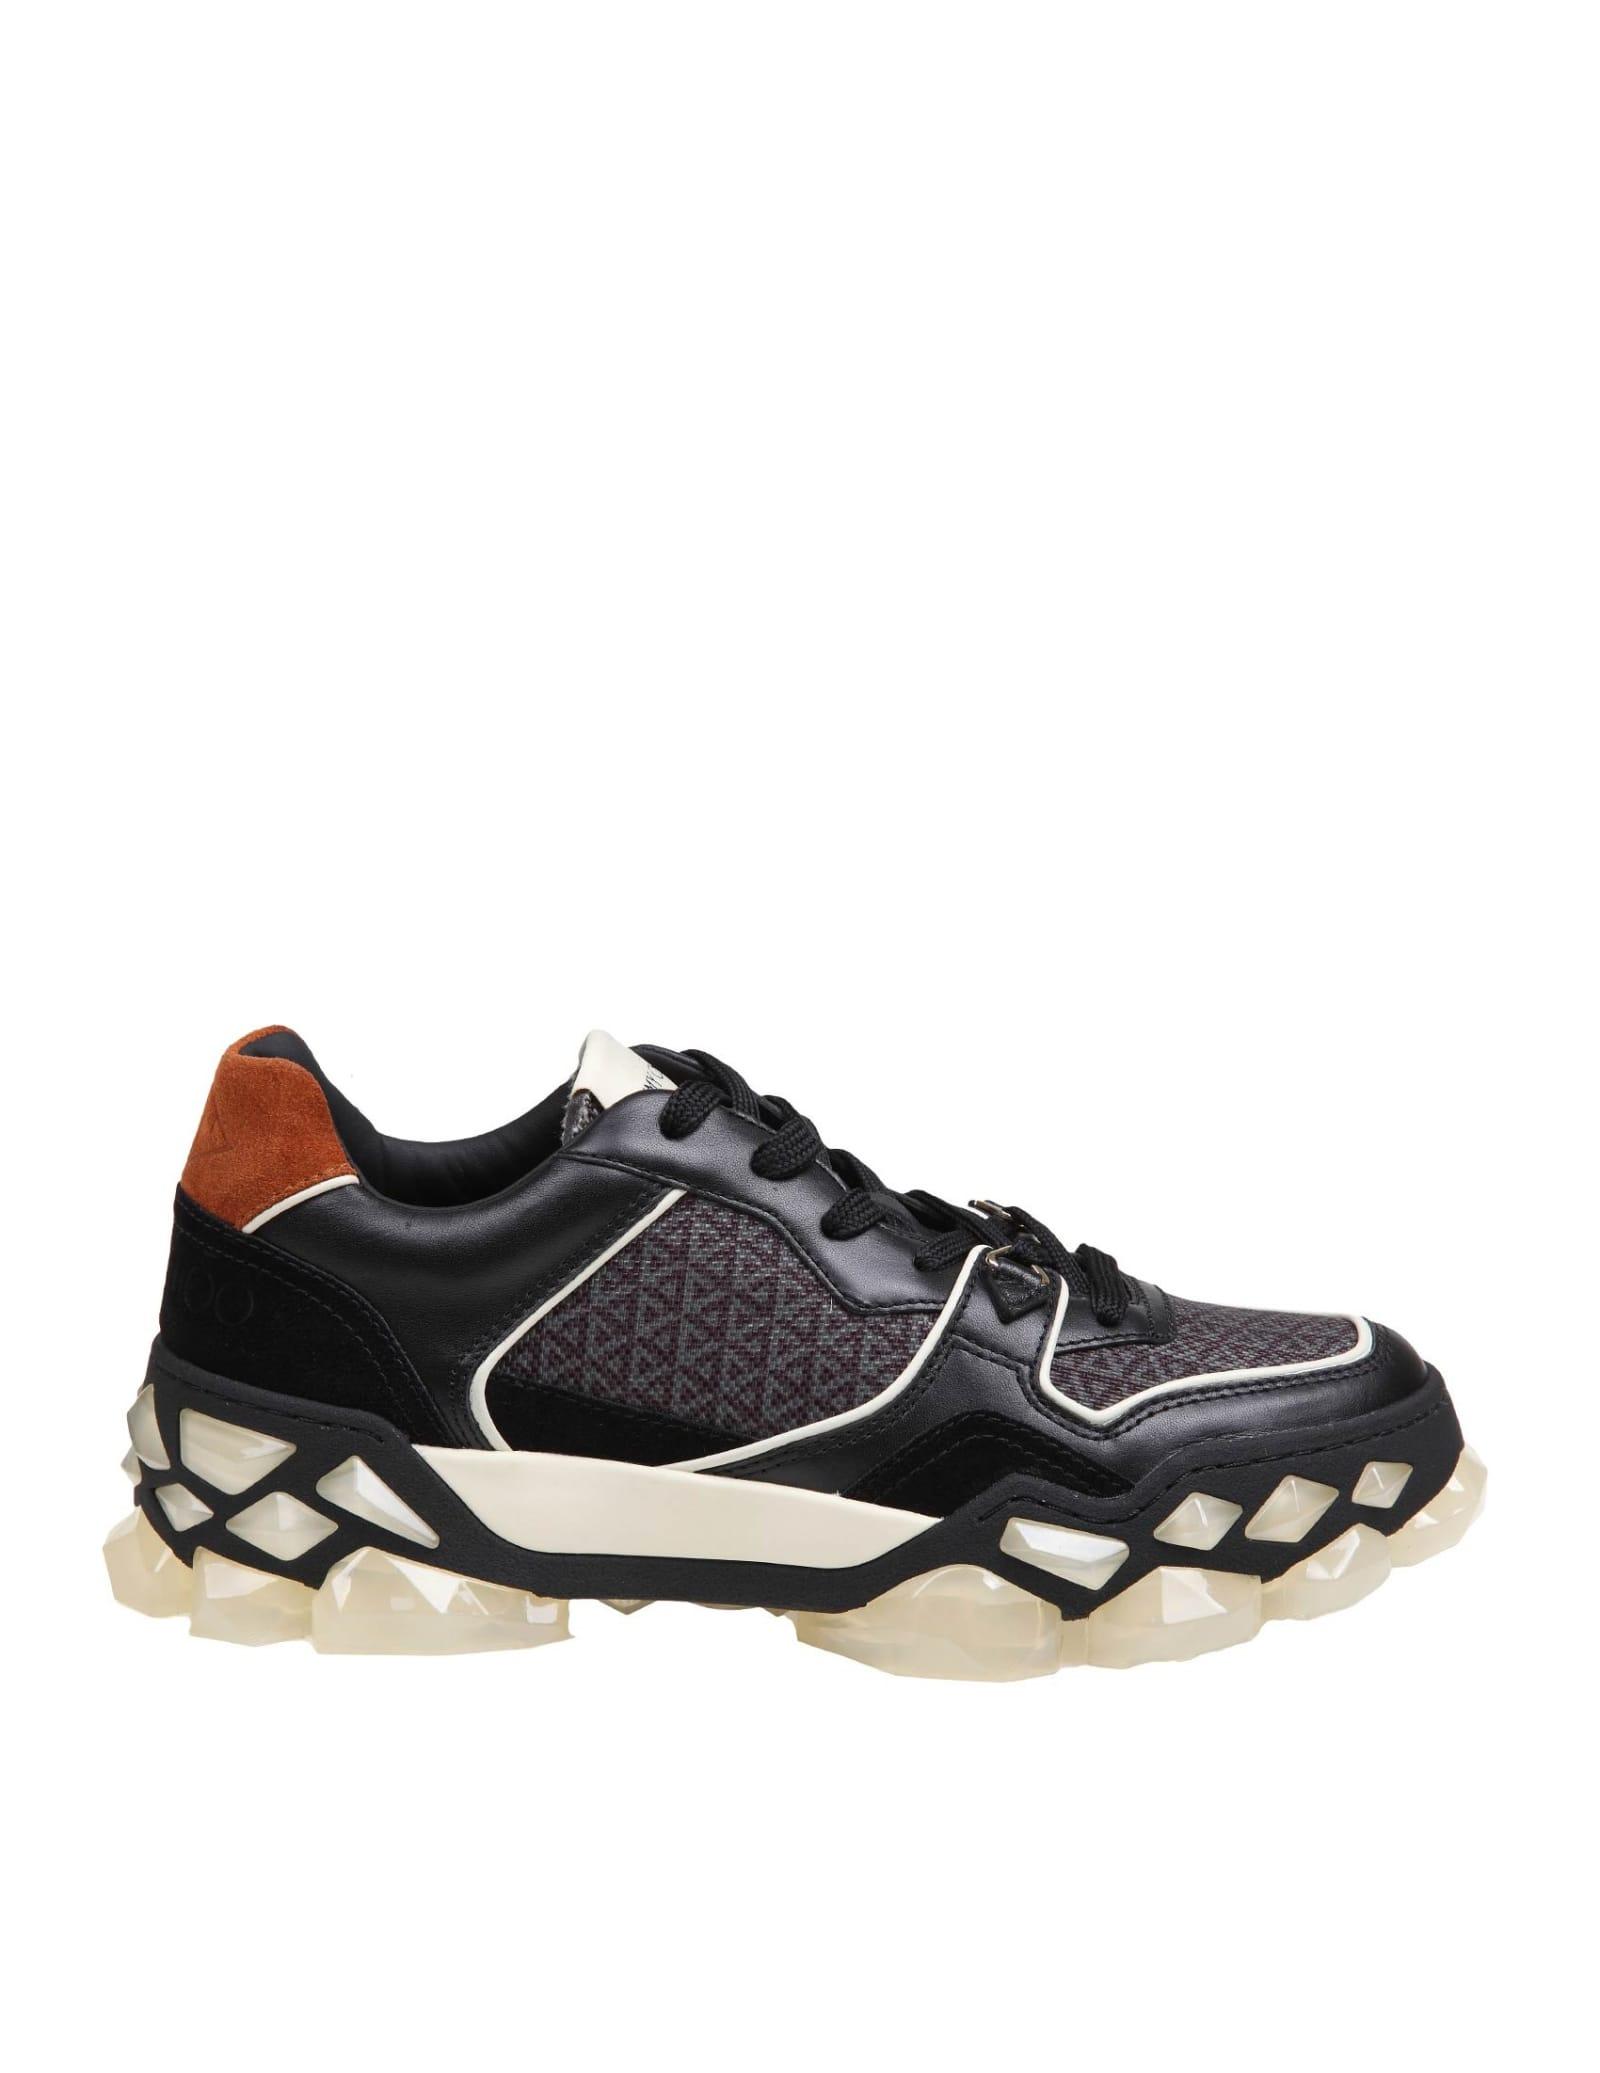 Jimmy Choo Diamond X Trainer / F. Sneakers